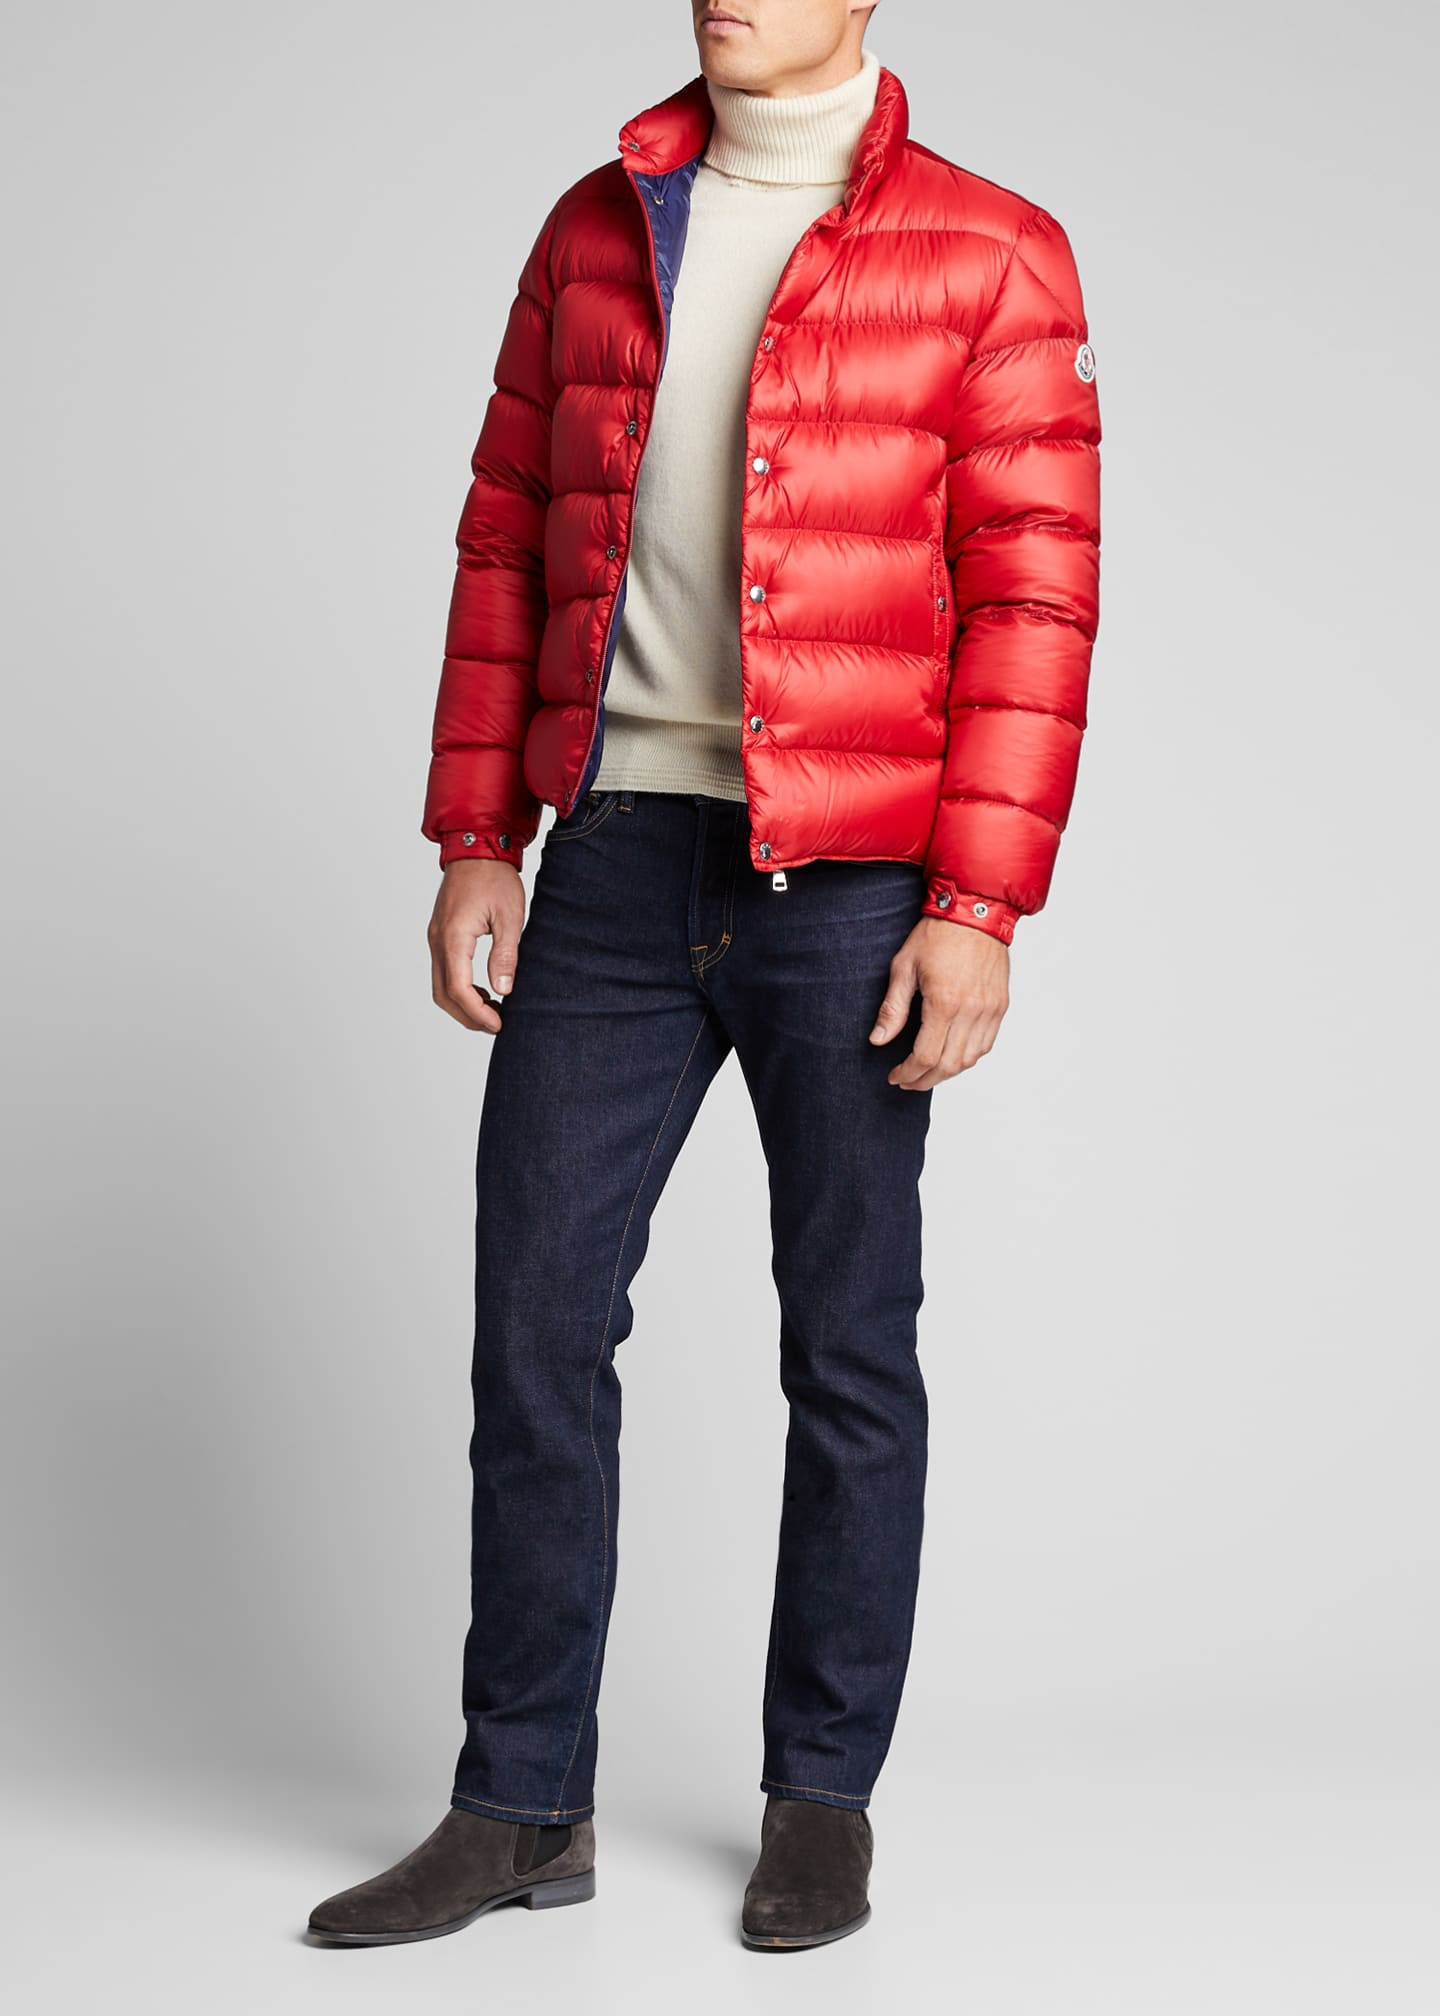 Moncler Men's Nylon Chrome-Button Puffer Jacket